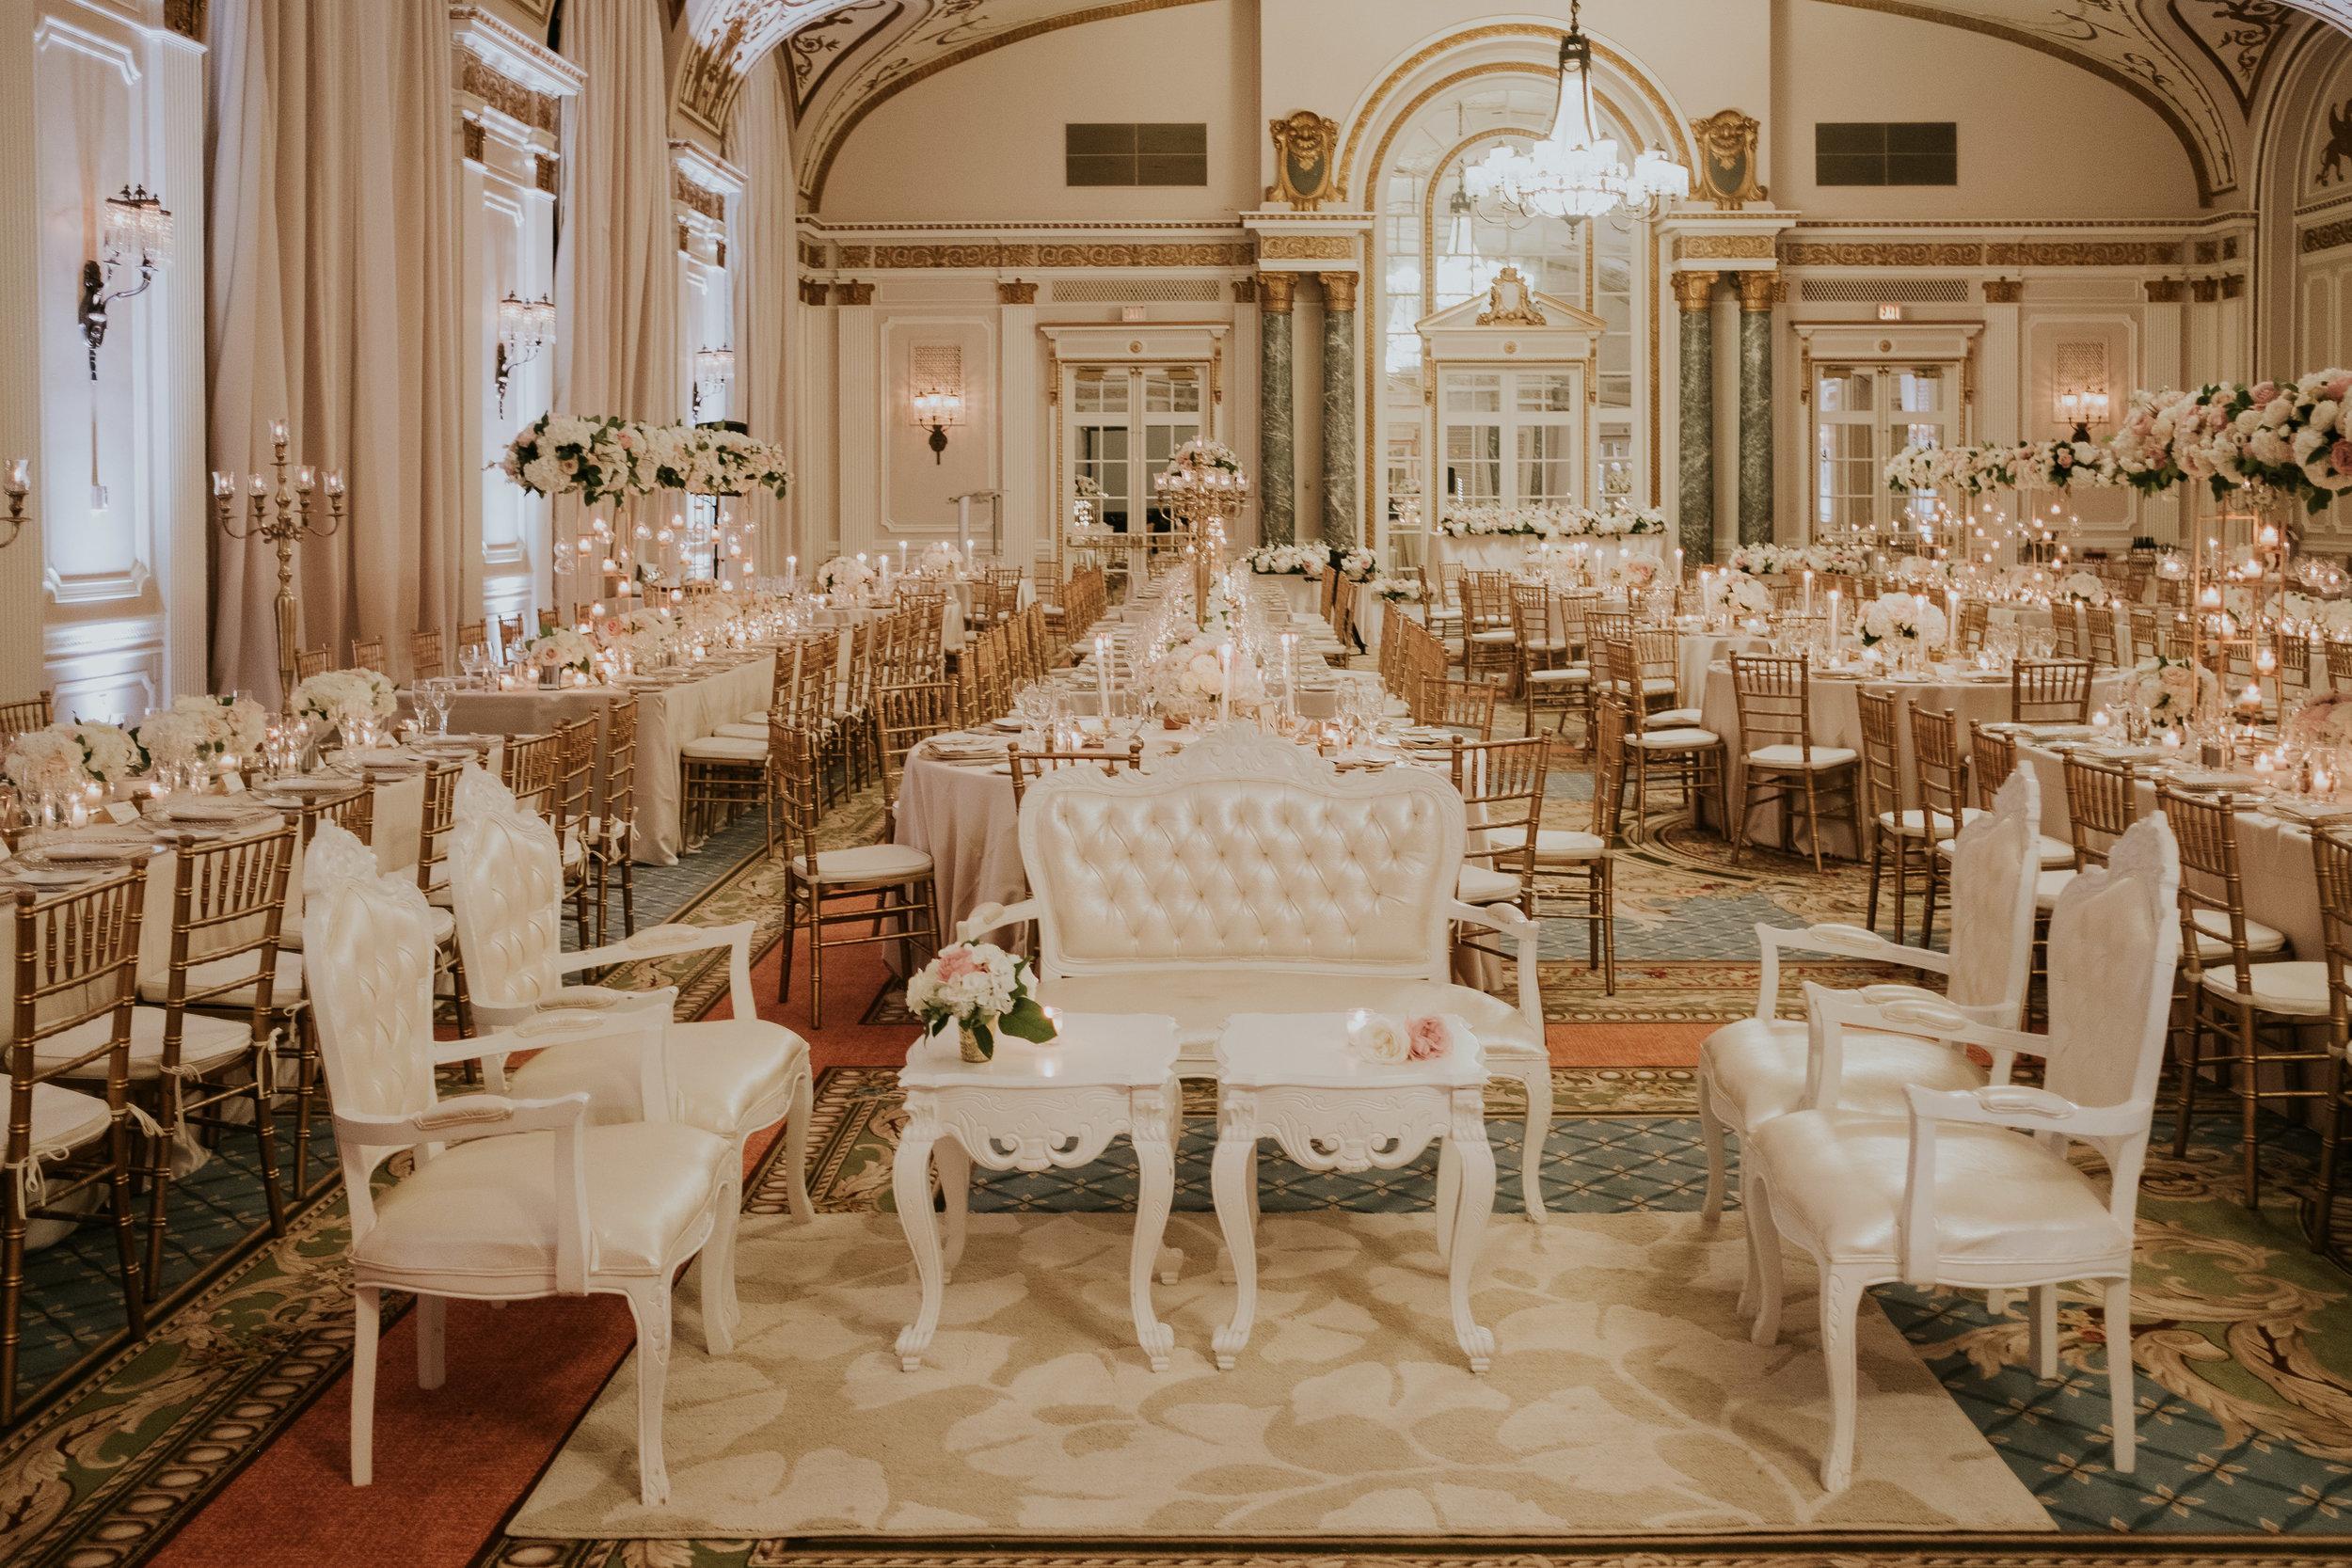 Komal Minhas Wedding Chateau Laurier, Toast Events, reception, ballroom